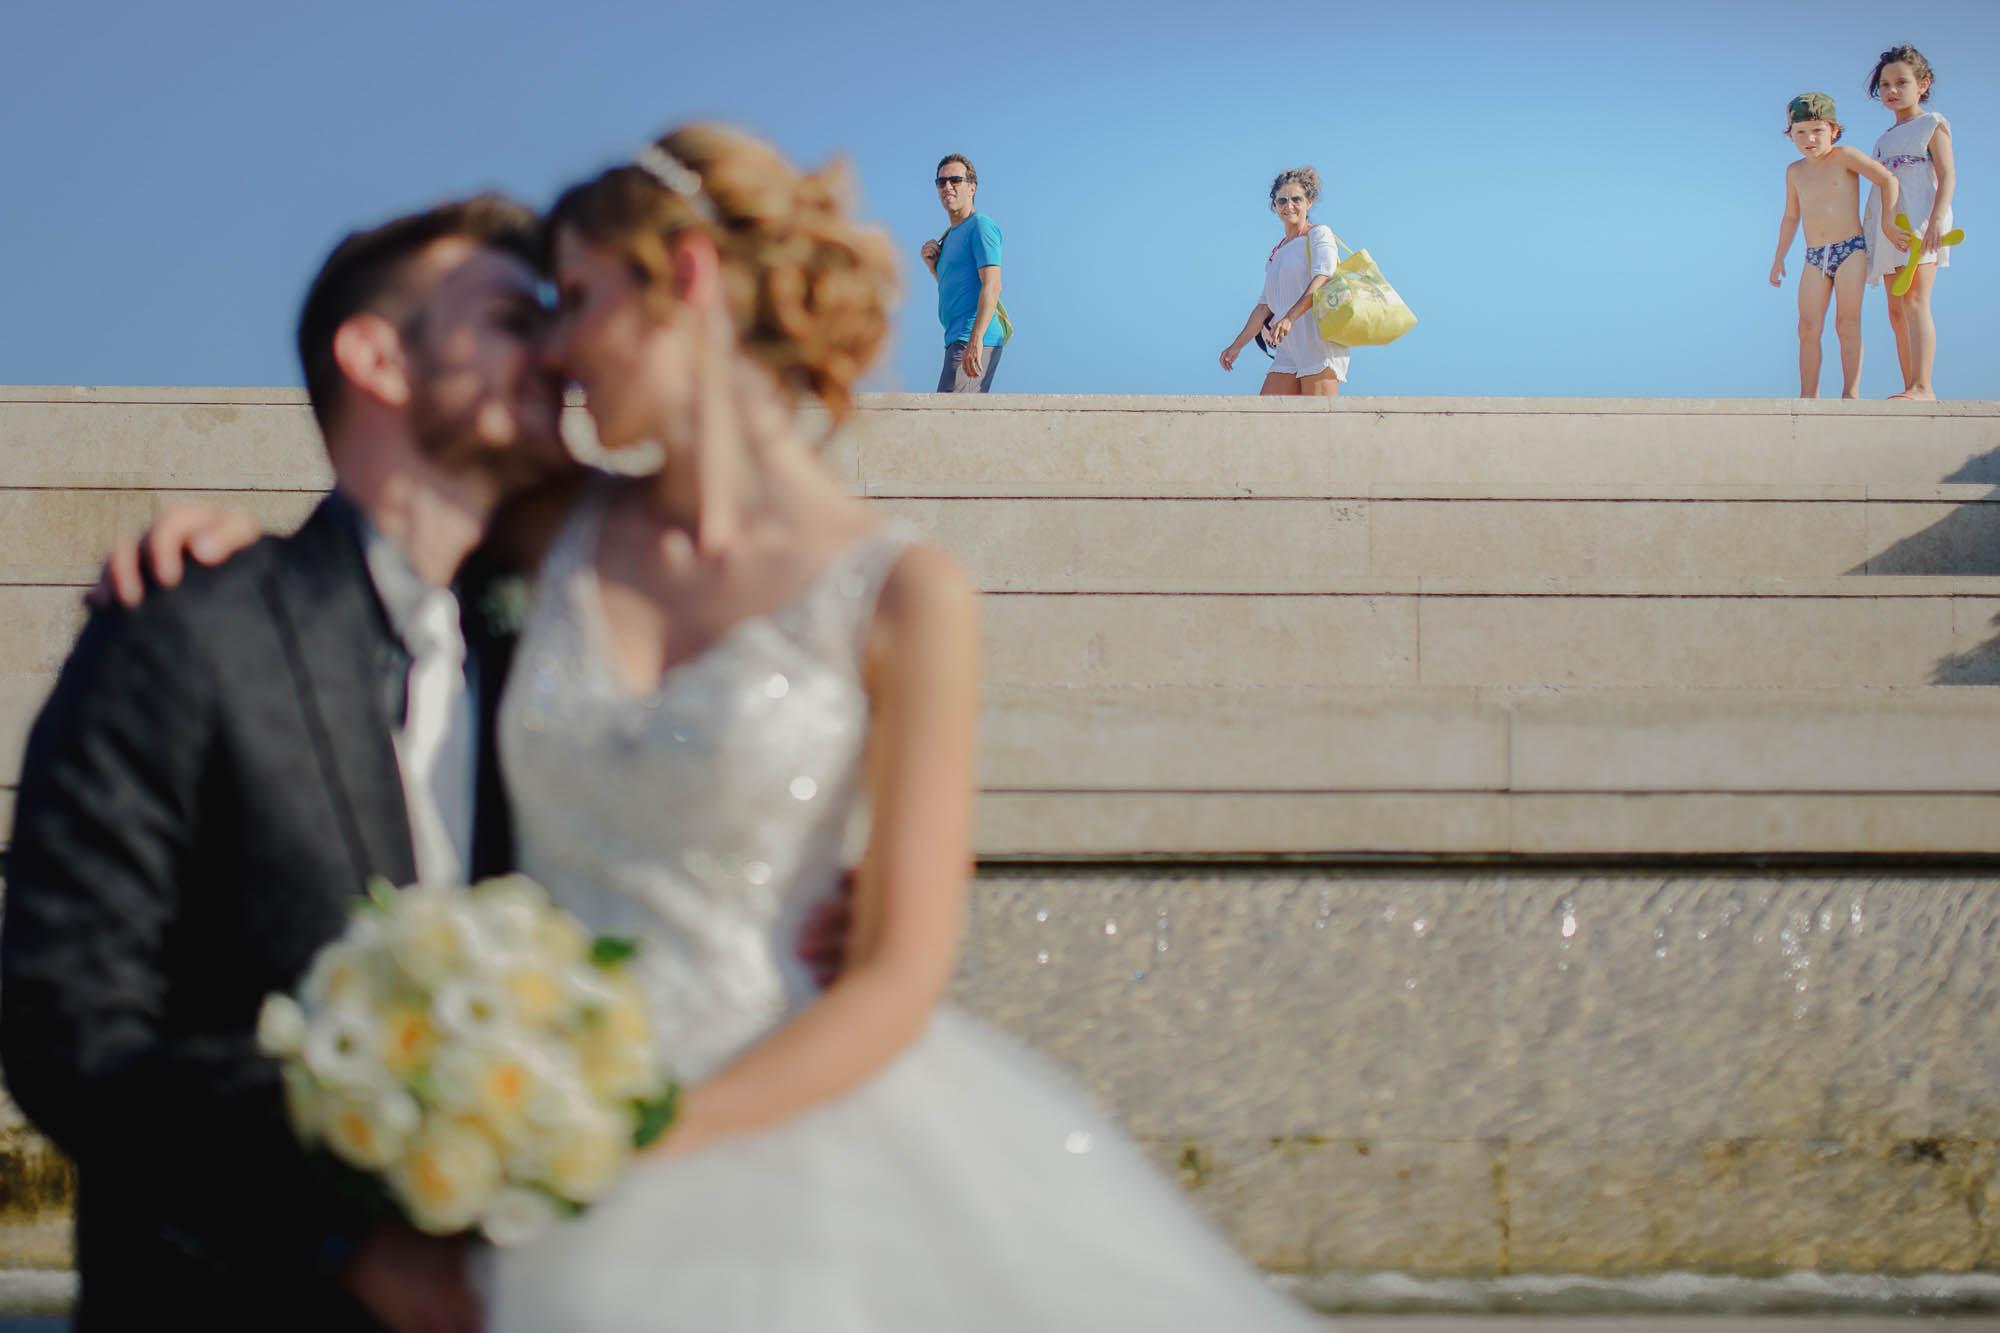 wedding photographer Venice Italy Luca Savino